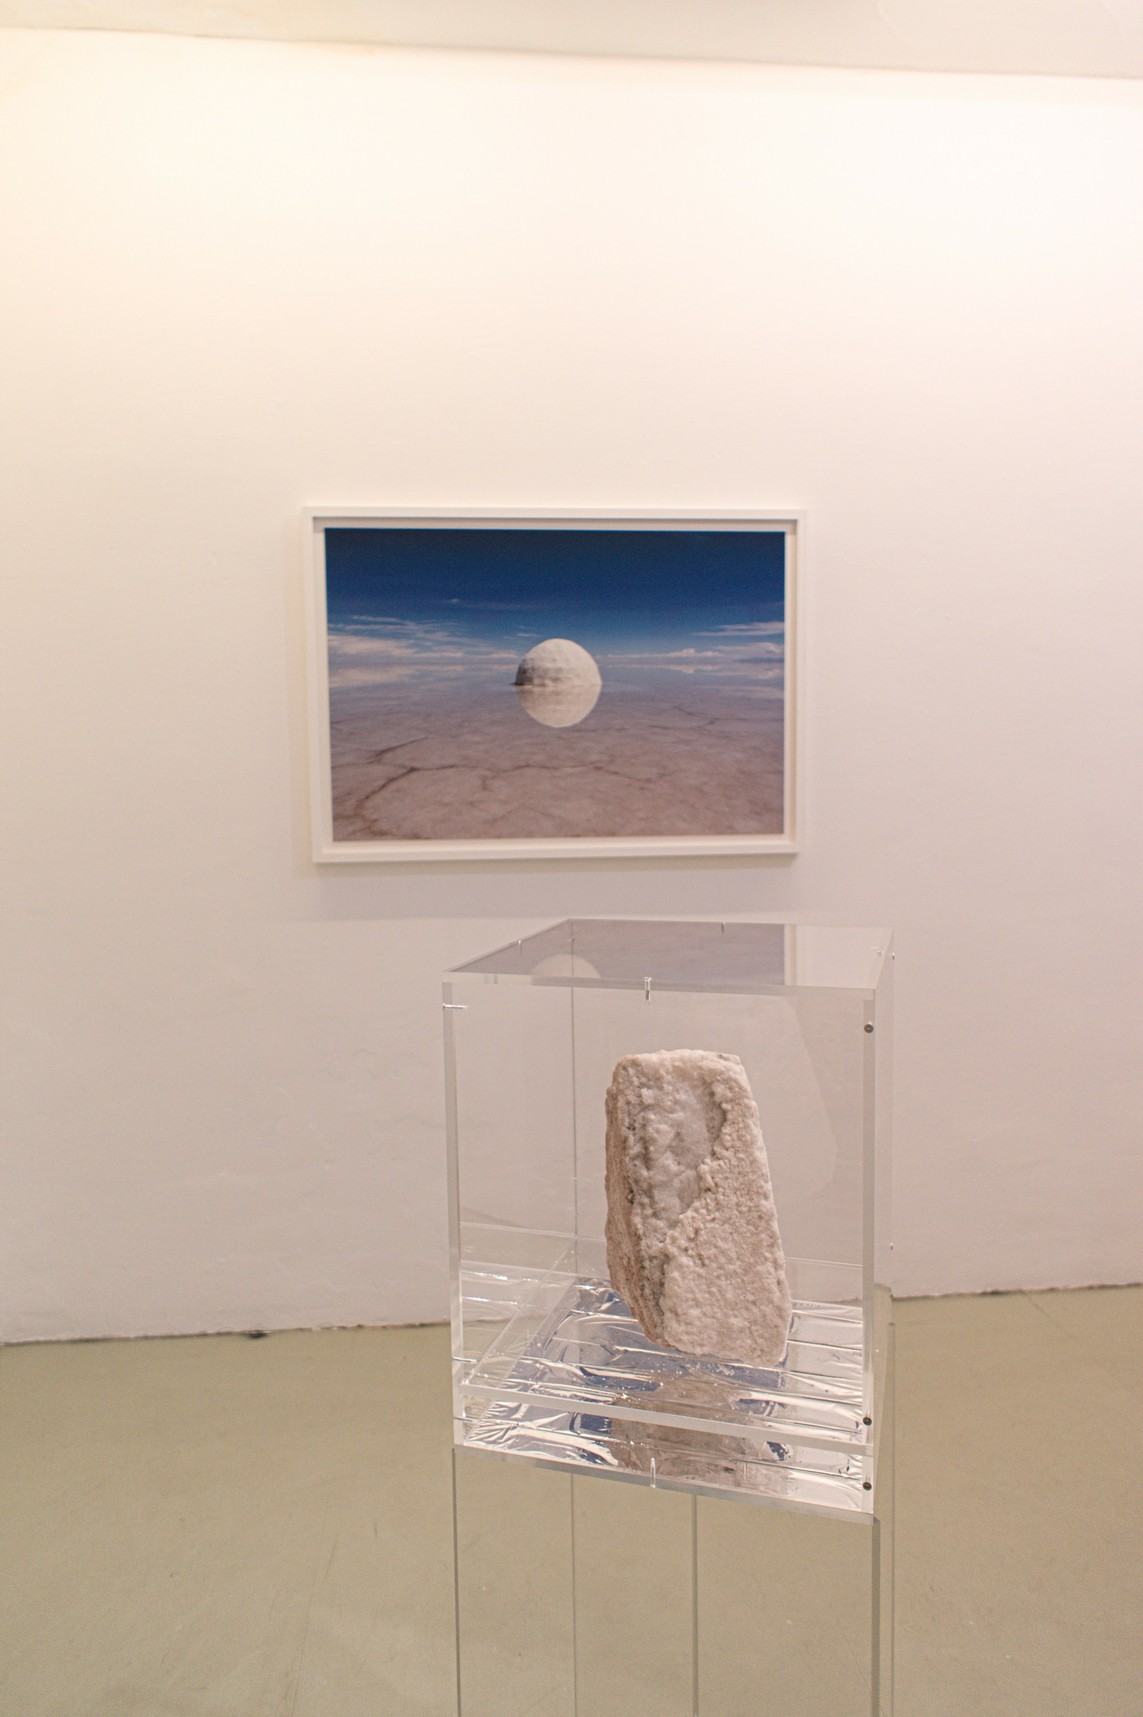 Elina – Pigmentdruck auf Hahnemühle 308g / 87,5 x 126,5 cm / 2015, Fragment of Elina – Salz, Plexiglas, Rettungsdecke / 128 x 40 x 40 cm / 2015